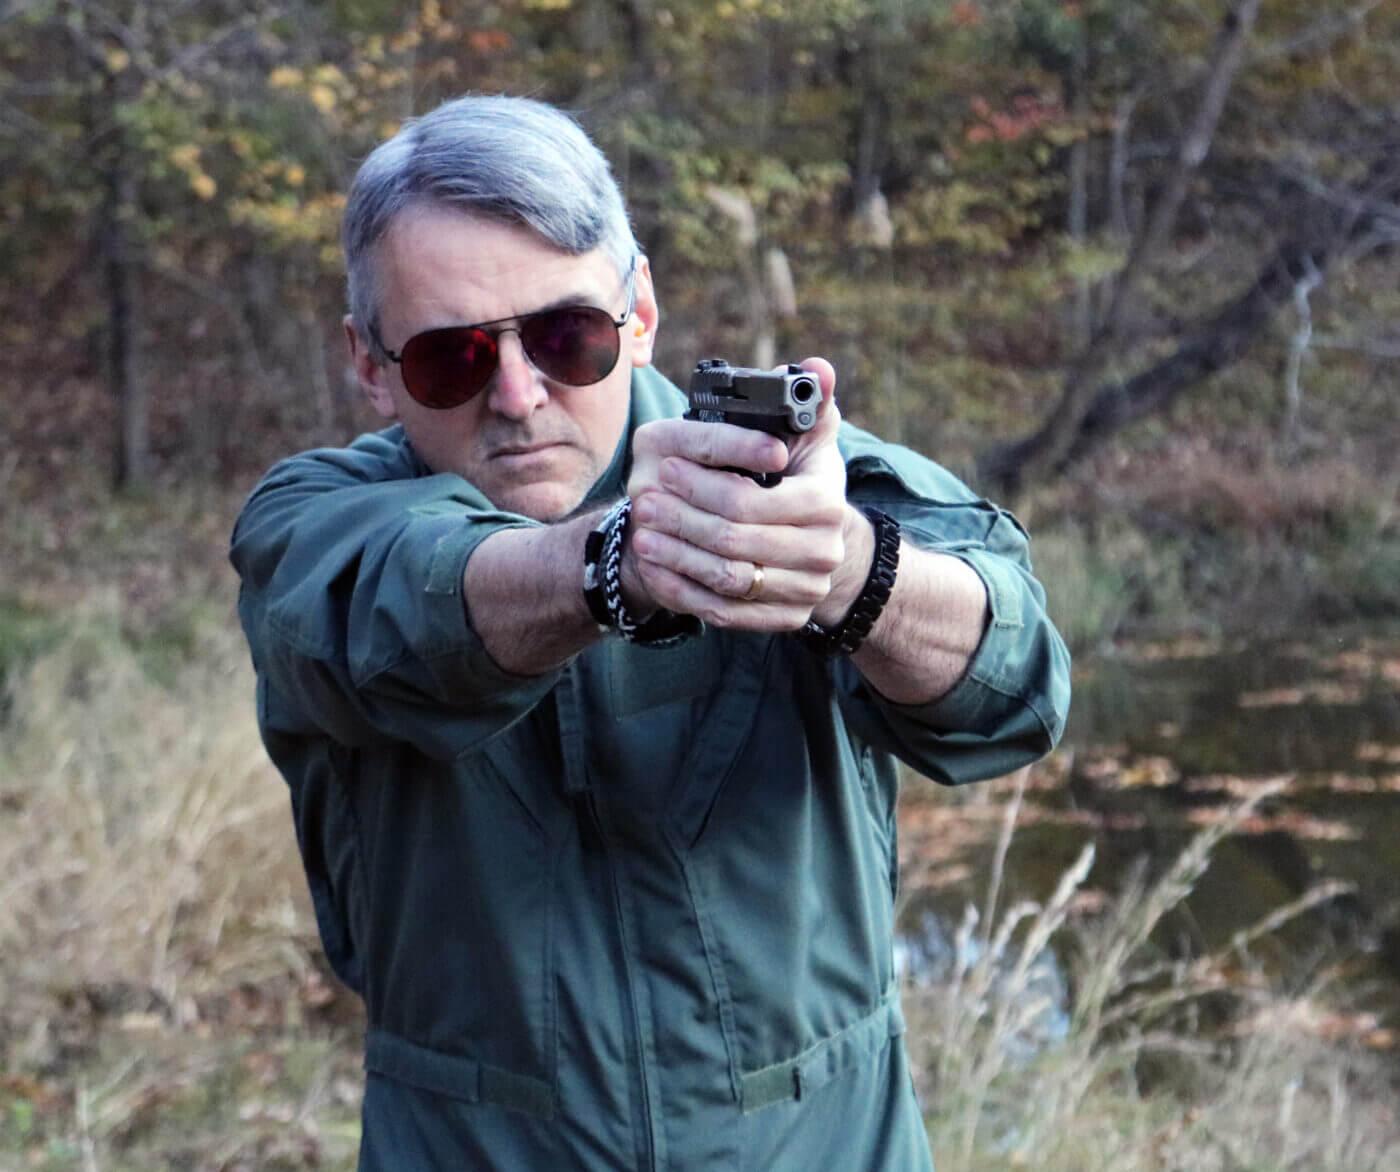 Shooting the 911 pistol